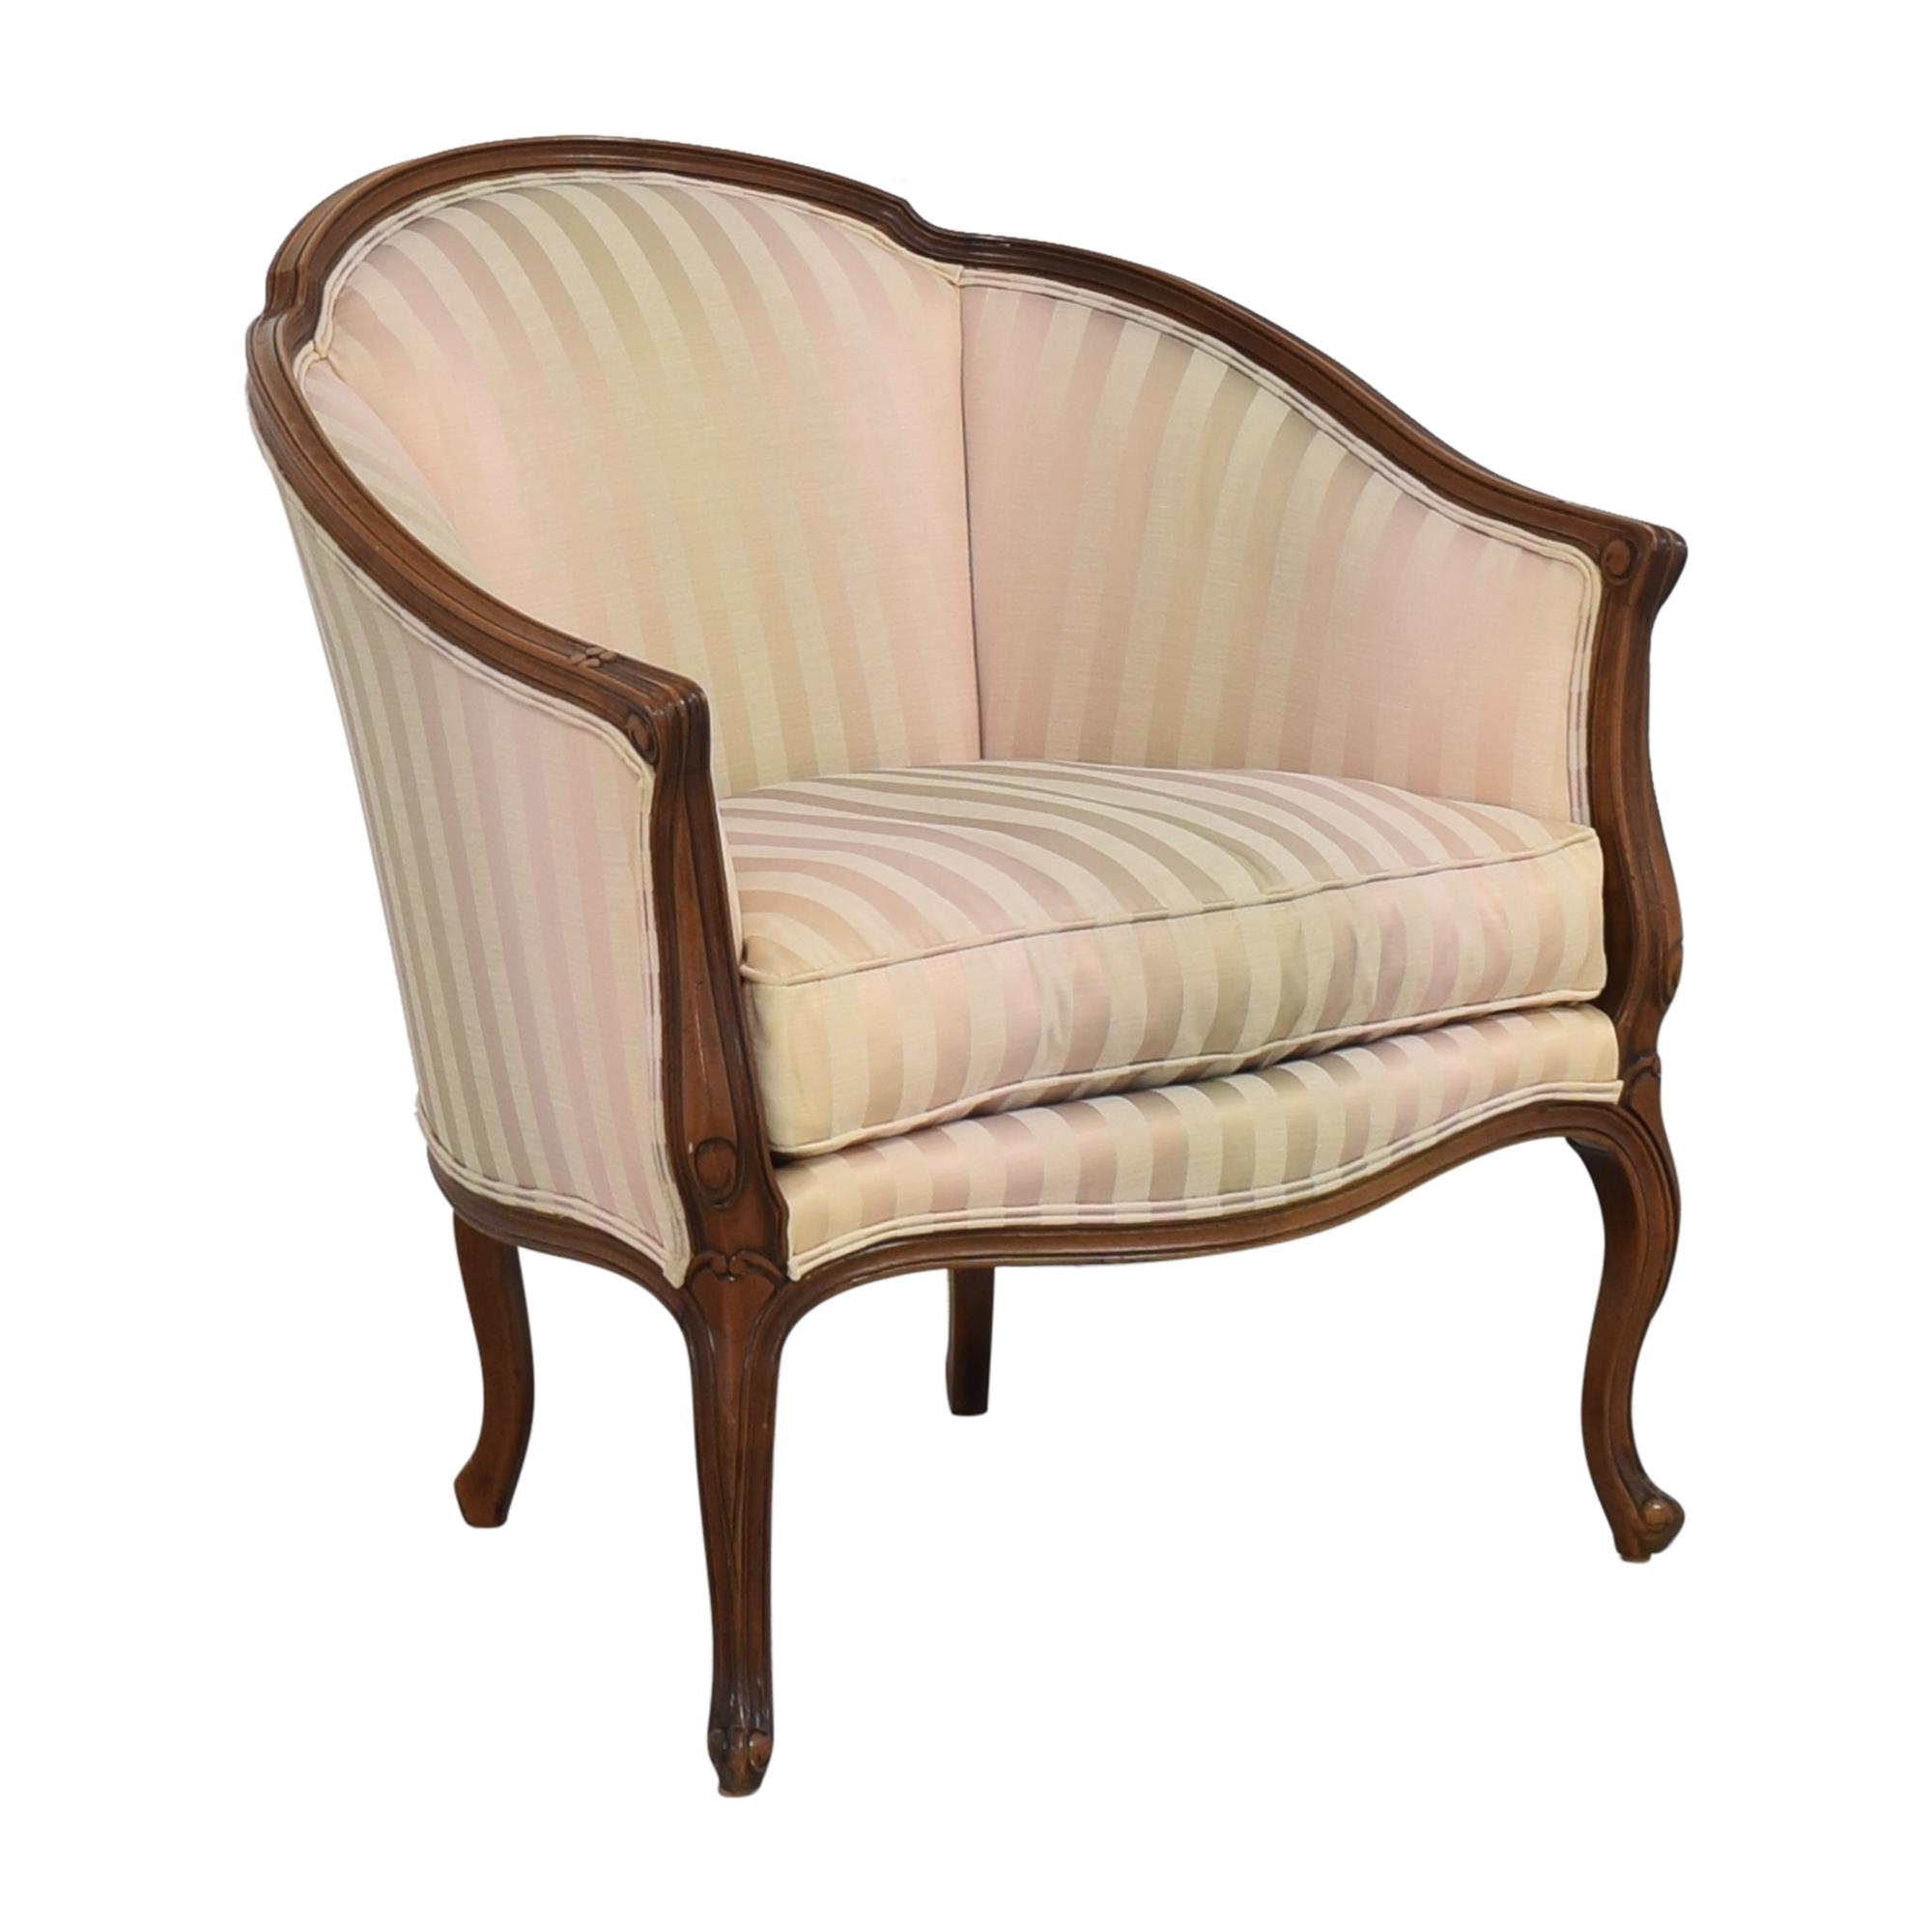 Century Furniture Century Furniture Barrel Accent Chair coupon